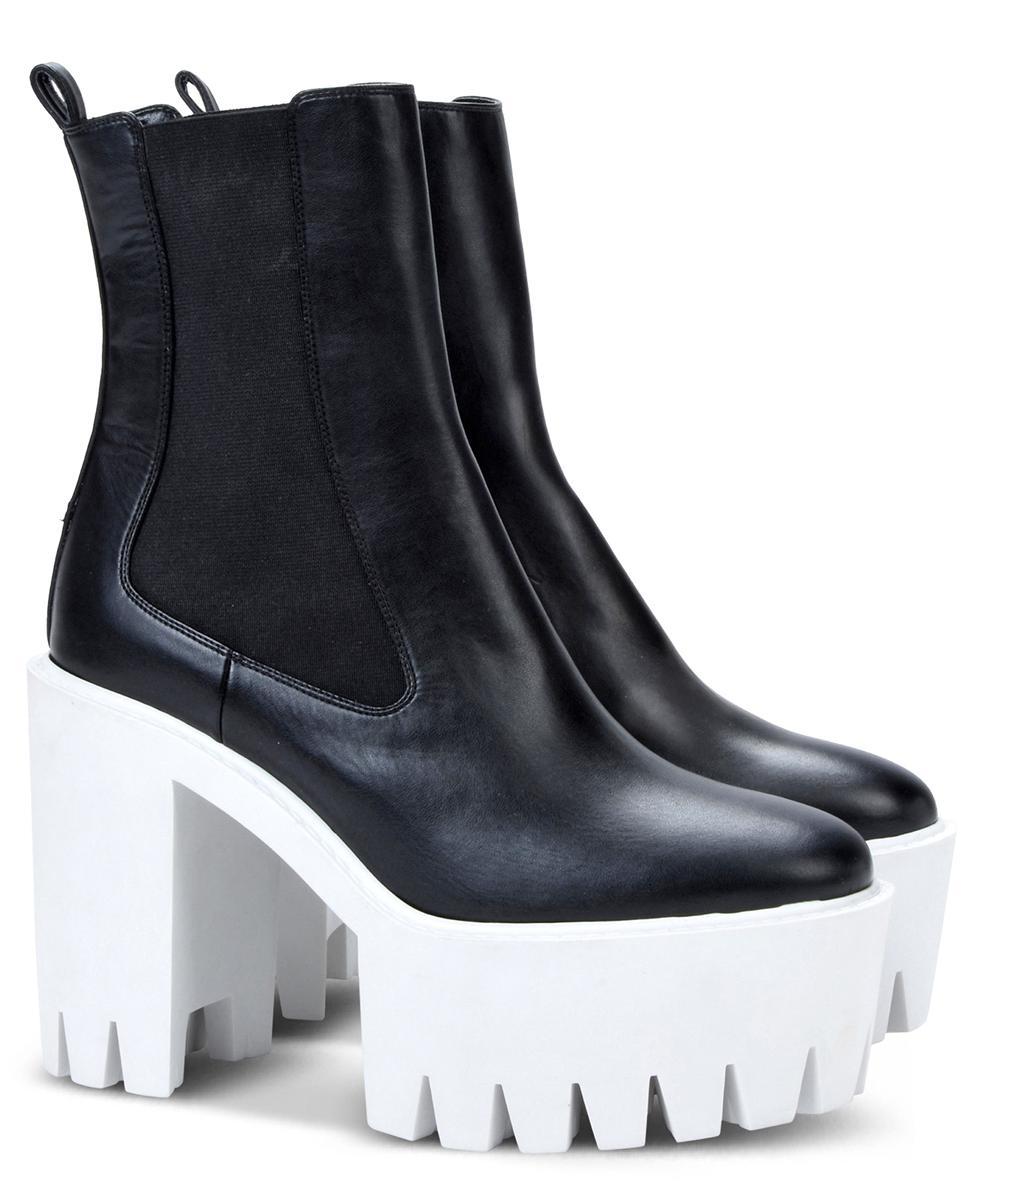 3826778c8872 Stella McCartney platform heels ankle boots in black faux leather - Italian  Boutique